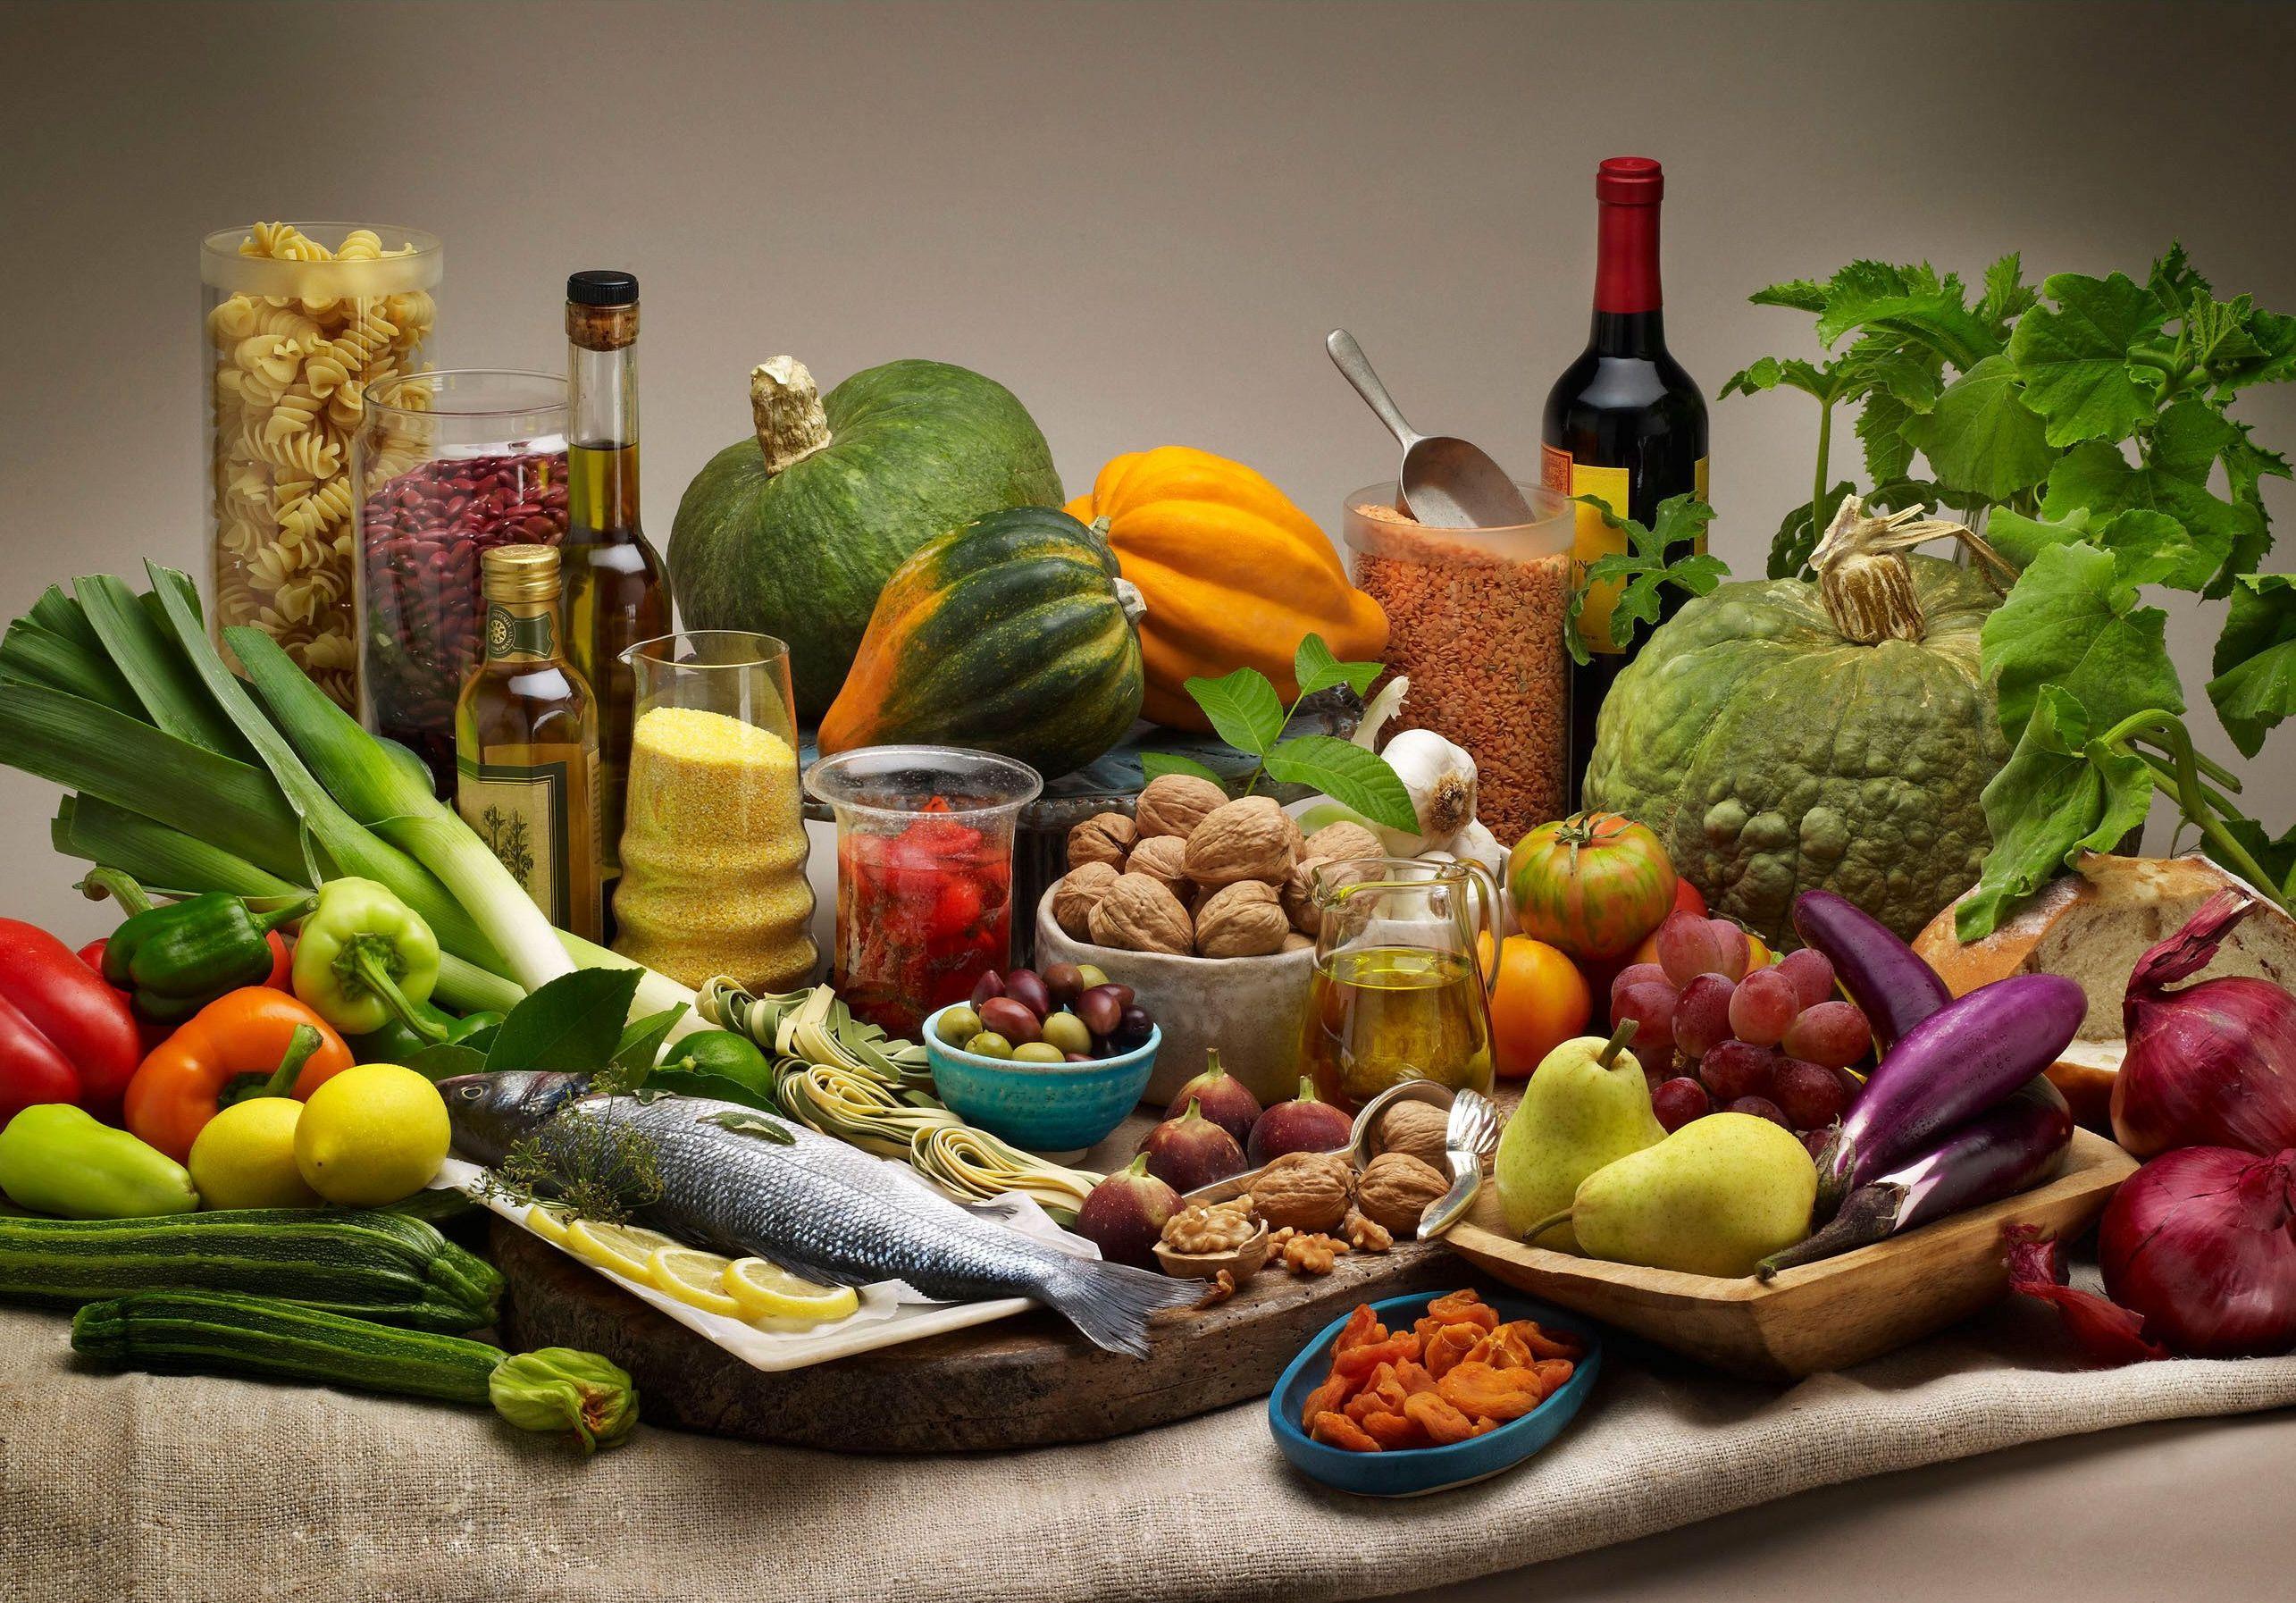 Mediterranean diet named No. 1 eating plan for 2019